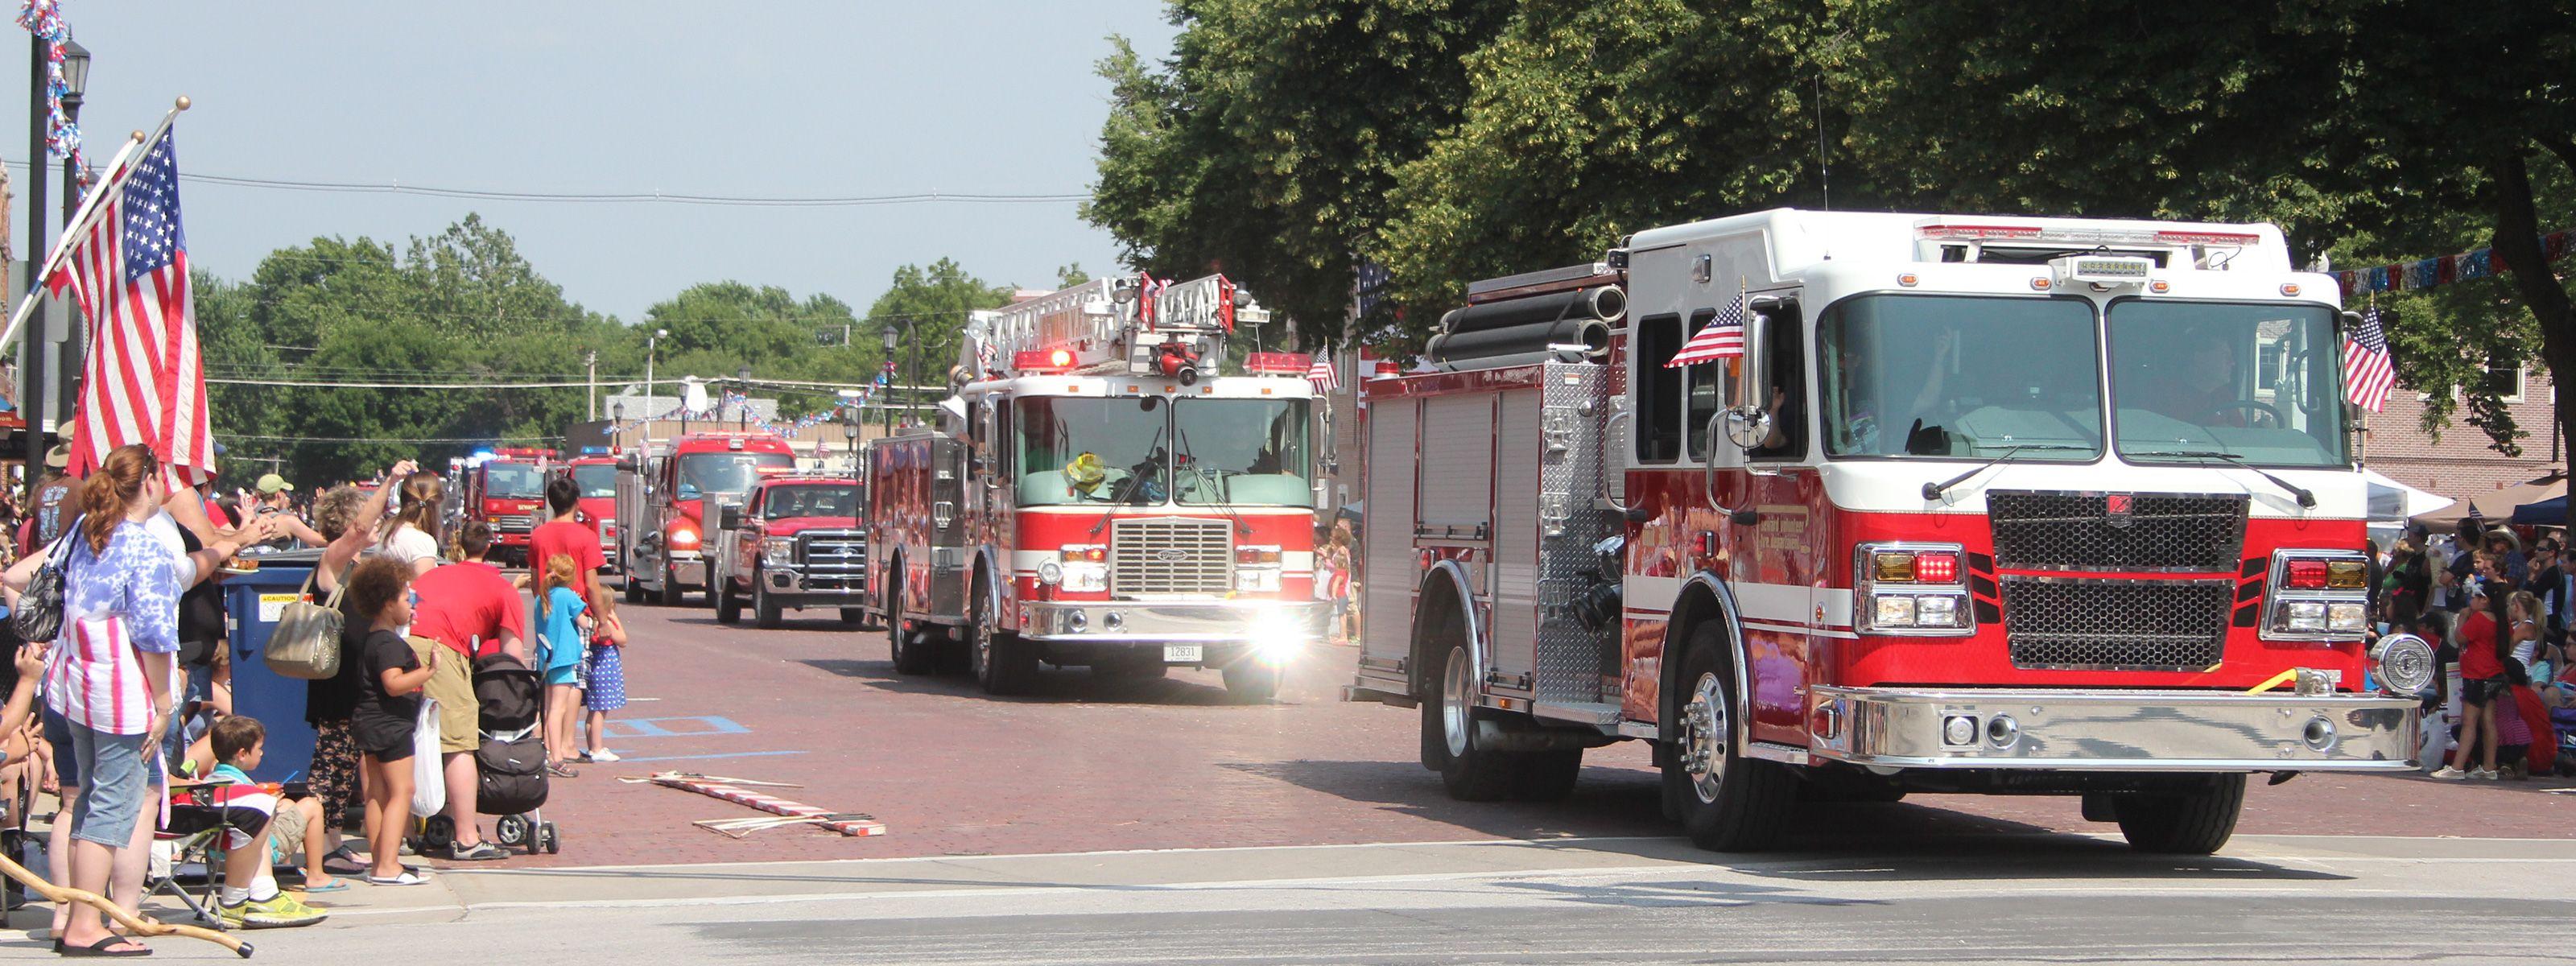 Fire trucks in the July 4th grand parade in Seward, Nebraska